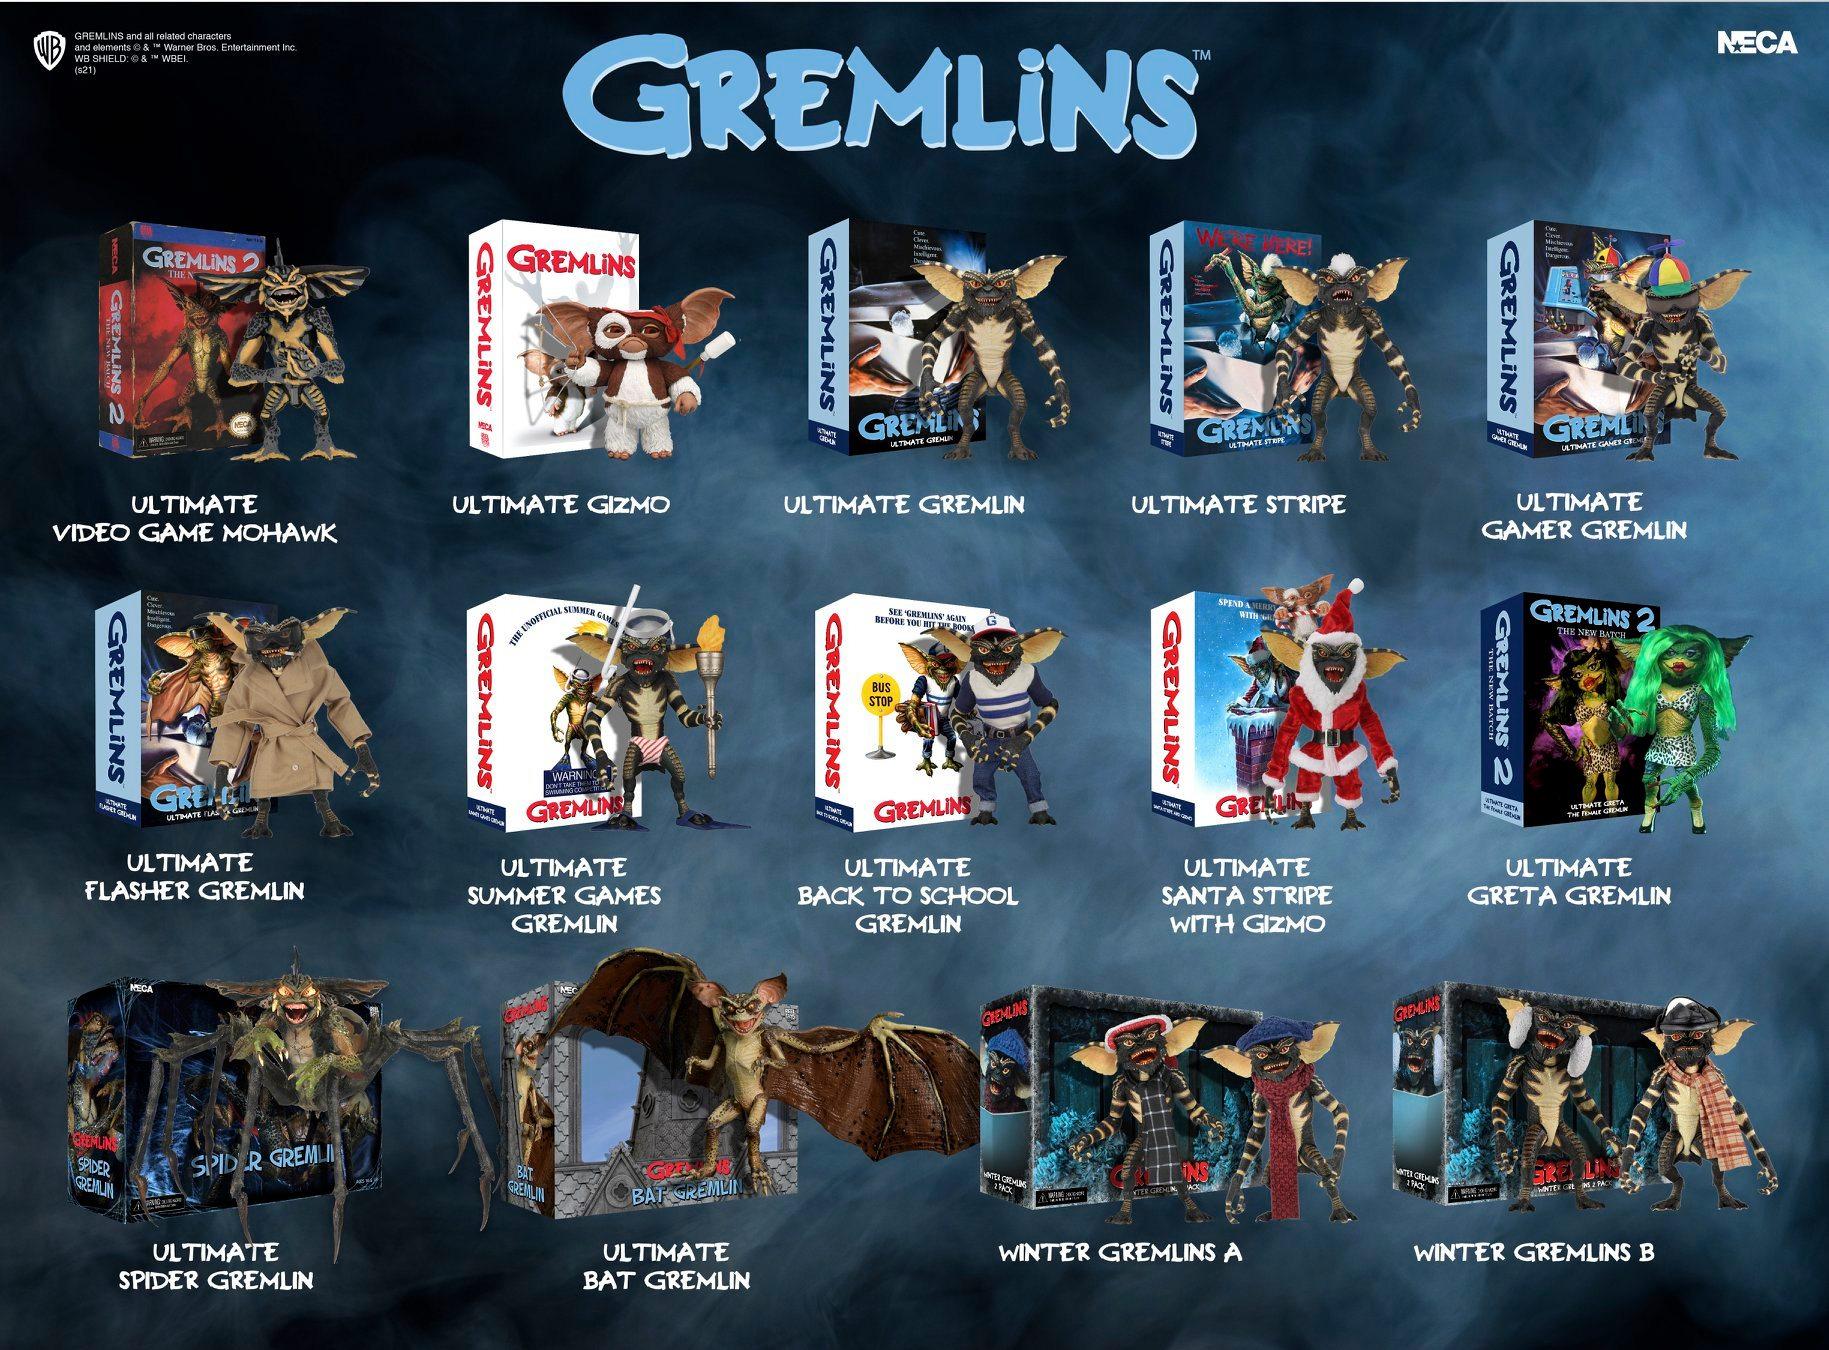 NECA Toys Gremlins 2020 Visual Guide